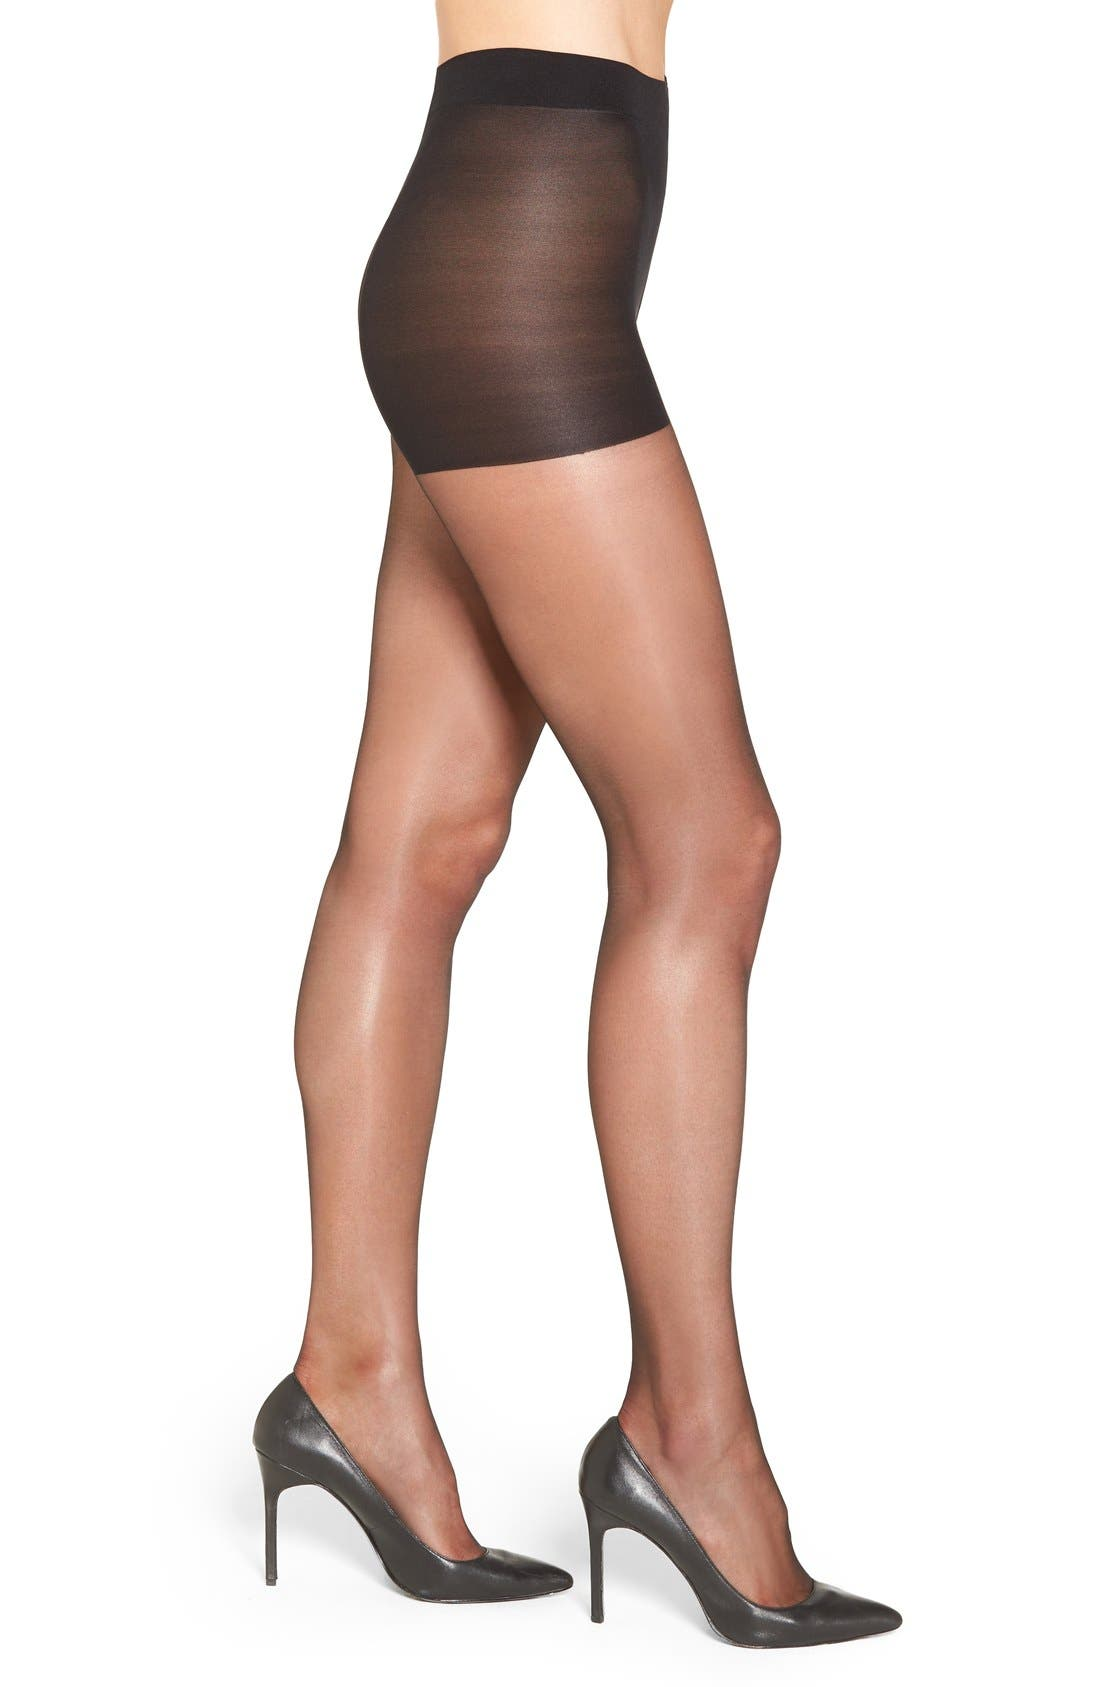 'Gloss' Control Top Pantyhose,                             Main thumbnail 1, color,                             BLACK